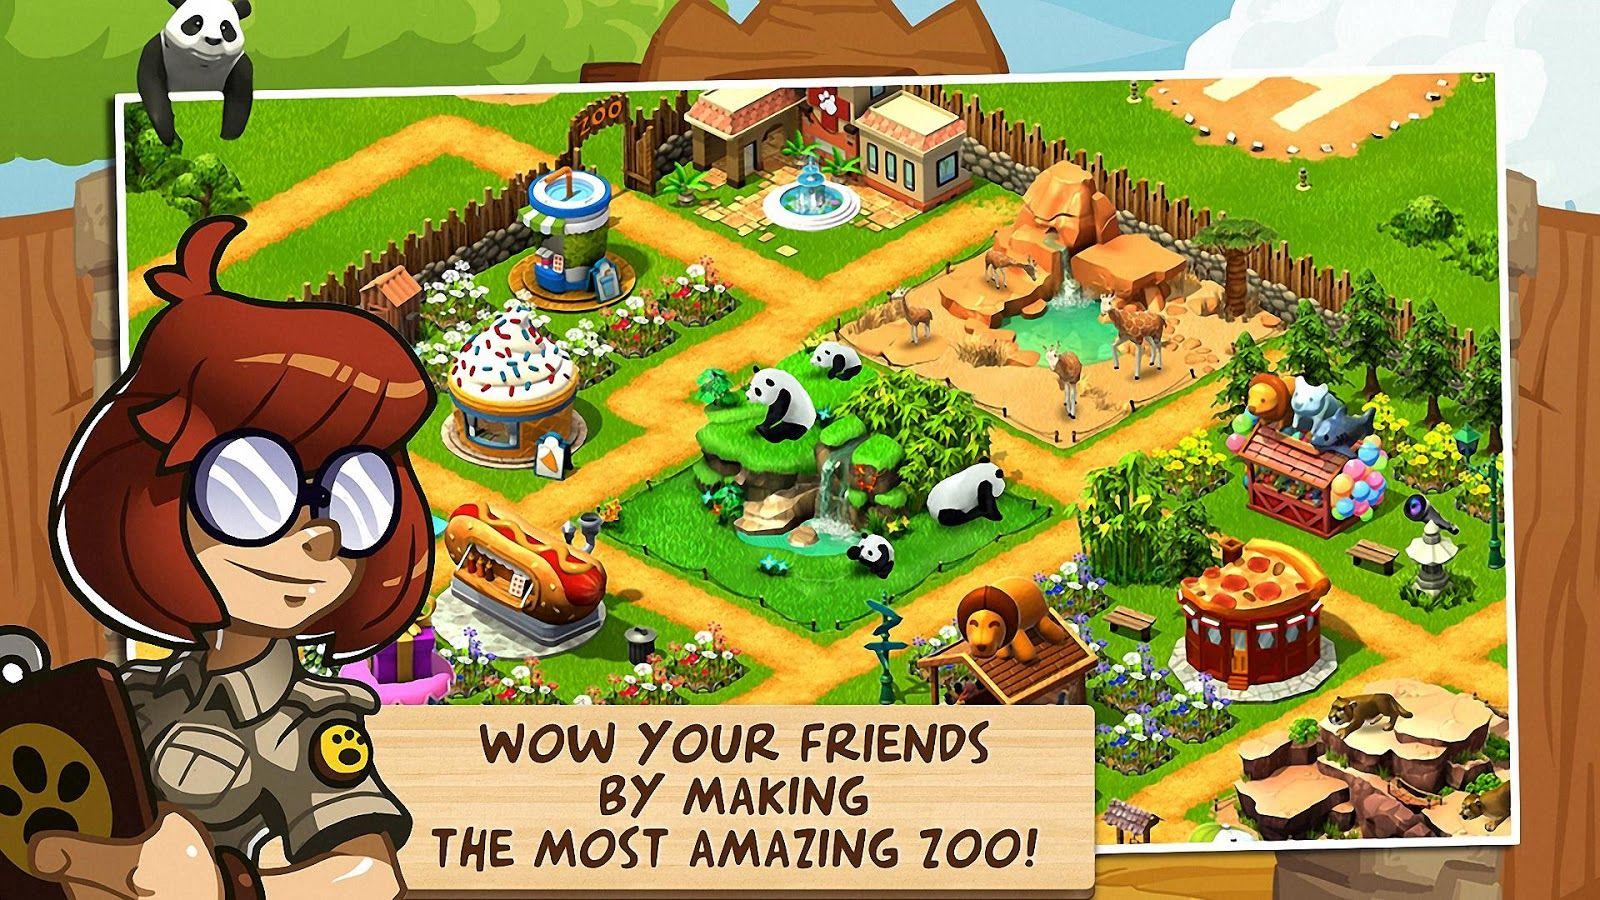 safari zoo time app - Google Search   Learn   Wonder zoo, Games